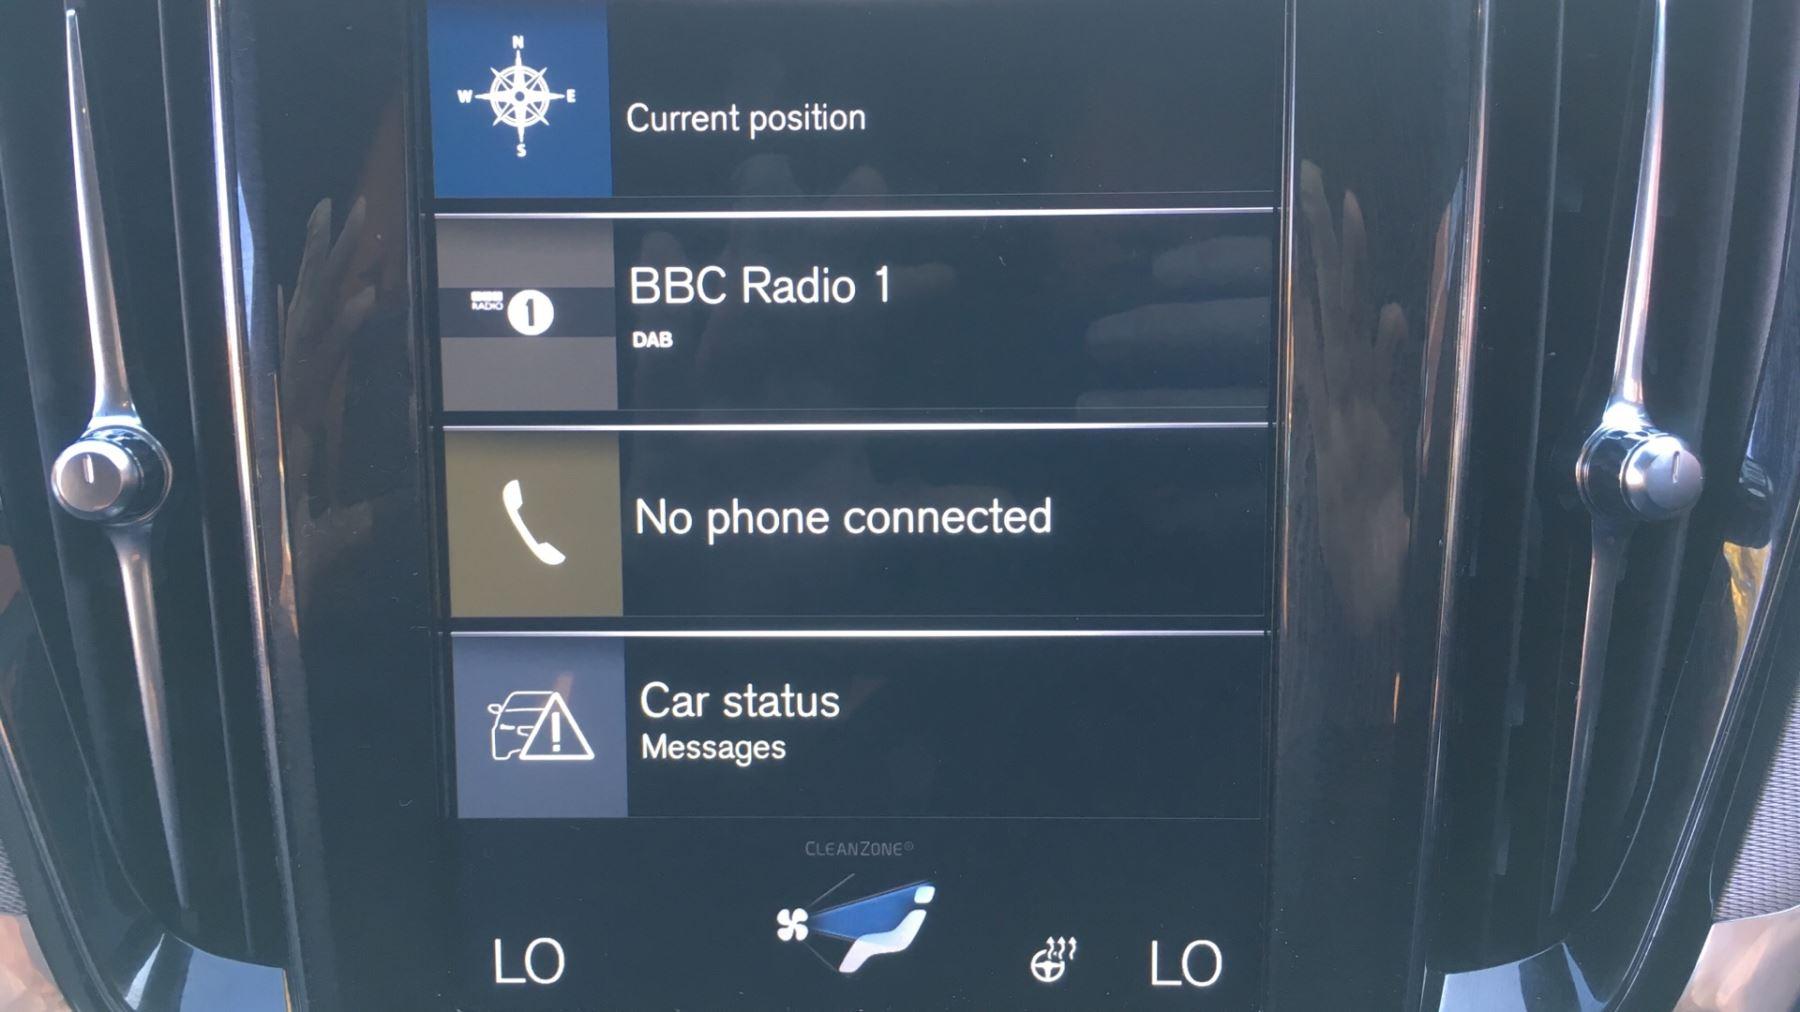 Volvo V60 2.0 D4 [190] R DESIGN 5dr - Volvo on Call, DAB Radio, SAT NAV, Park Assist image 24